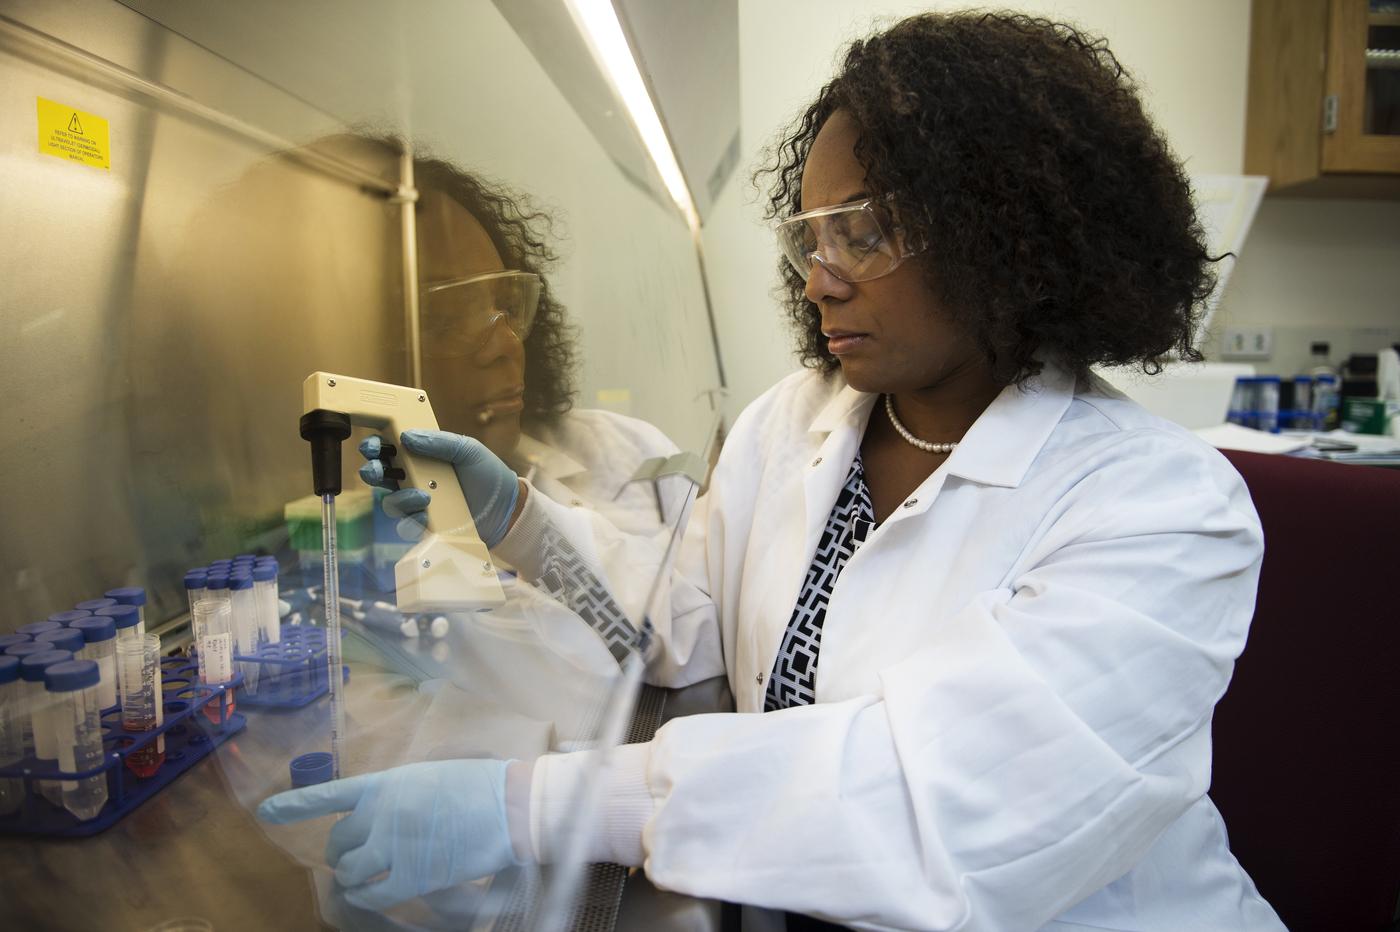 09/14/15 - BOSTON, MA. - Eno Ebong works in her lab on Sept. 14, 2015.  Photo by Adam Glanzman/Northeastern University